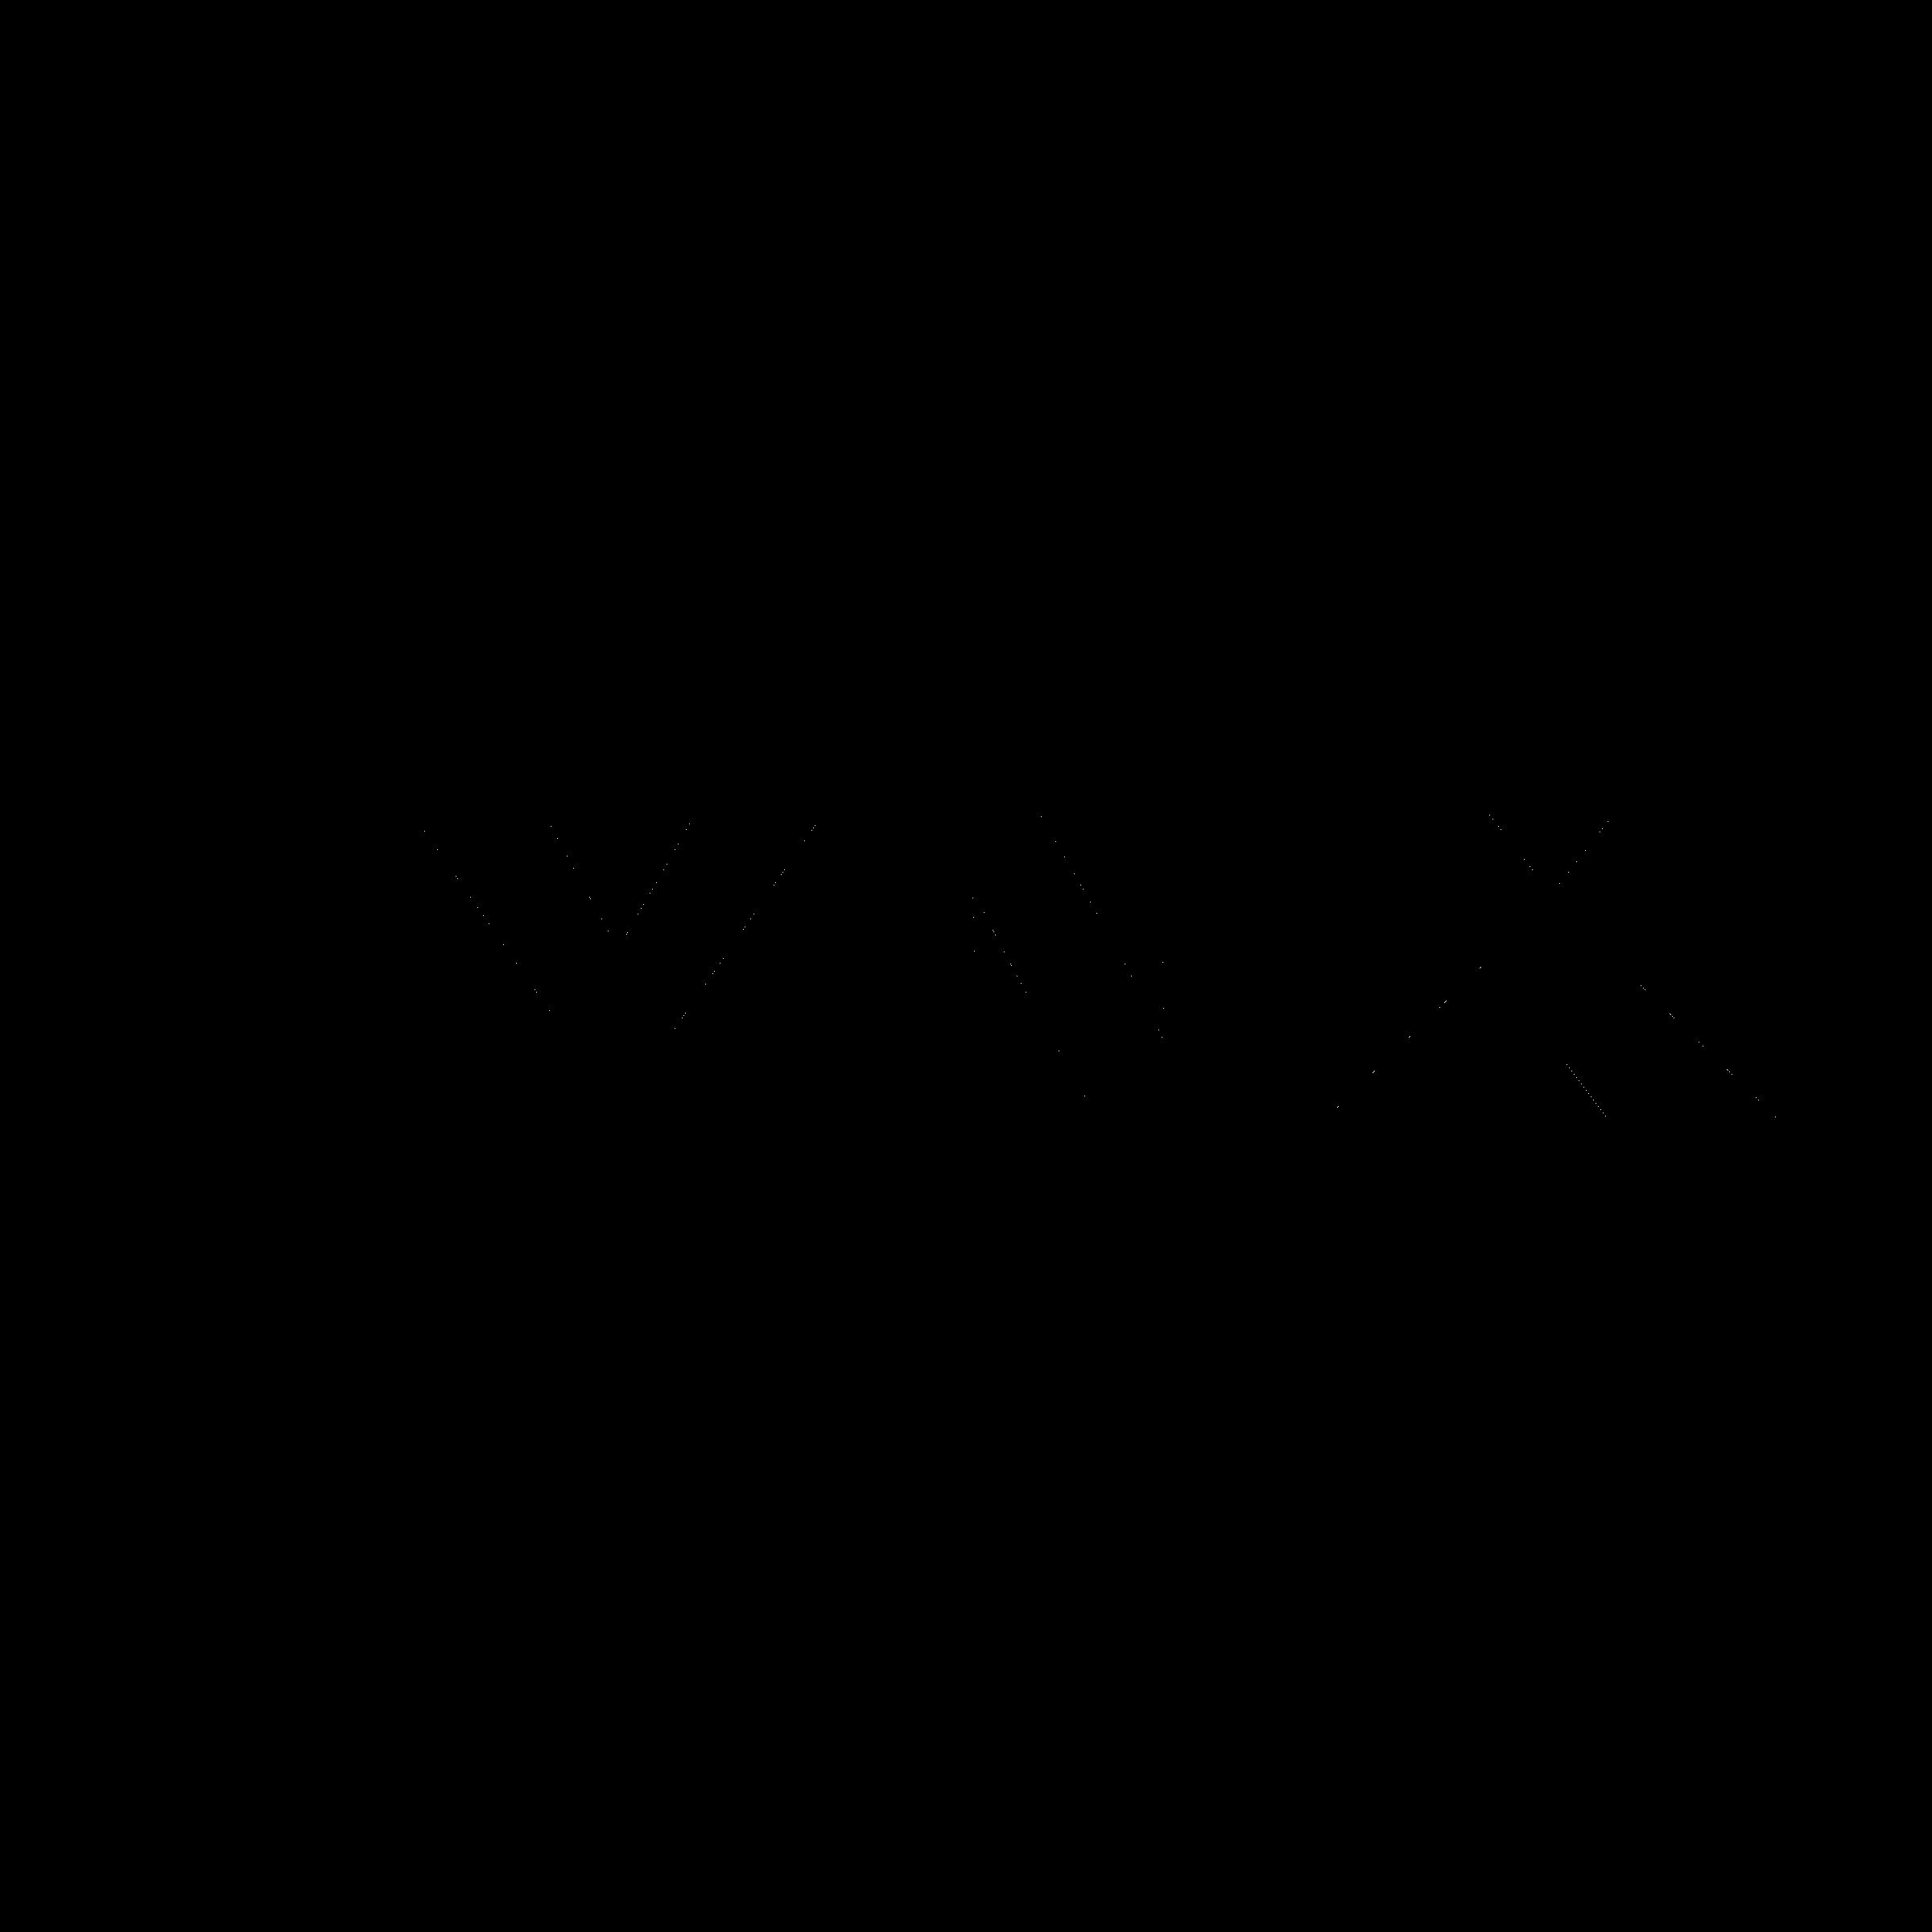 lynx logo png transparent svg vector freebie supply lynx logo png transparent svg vector